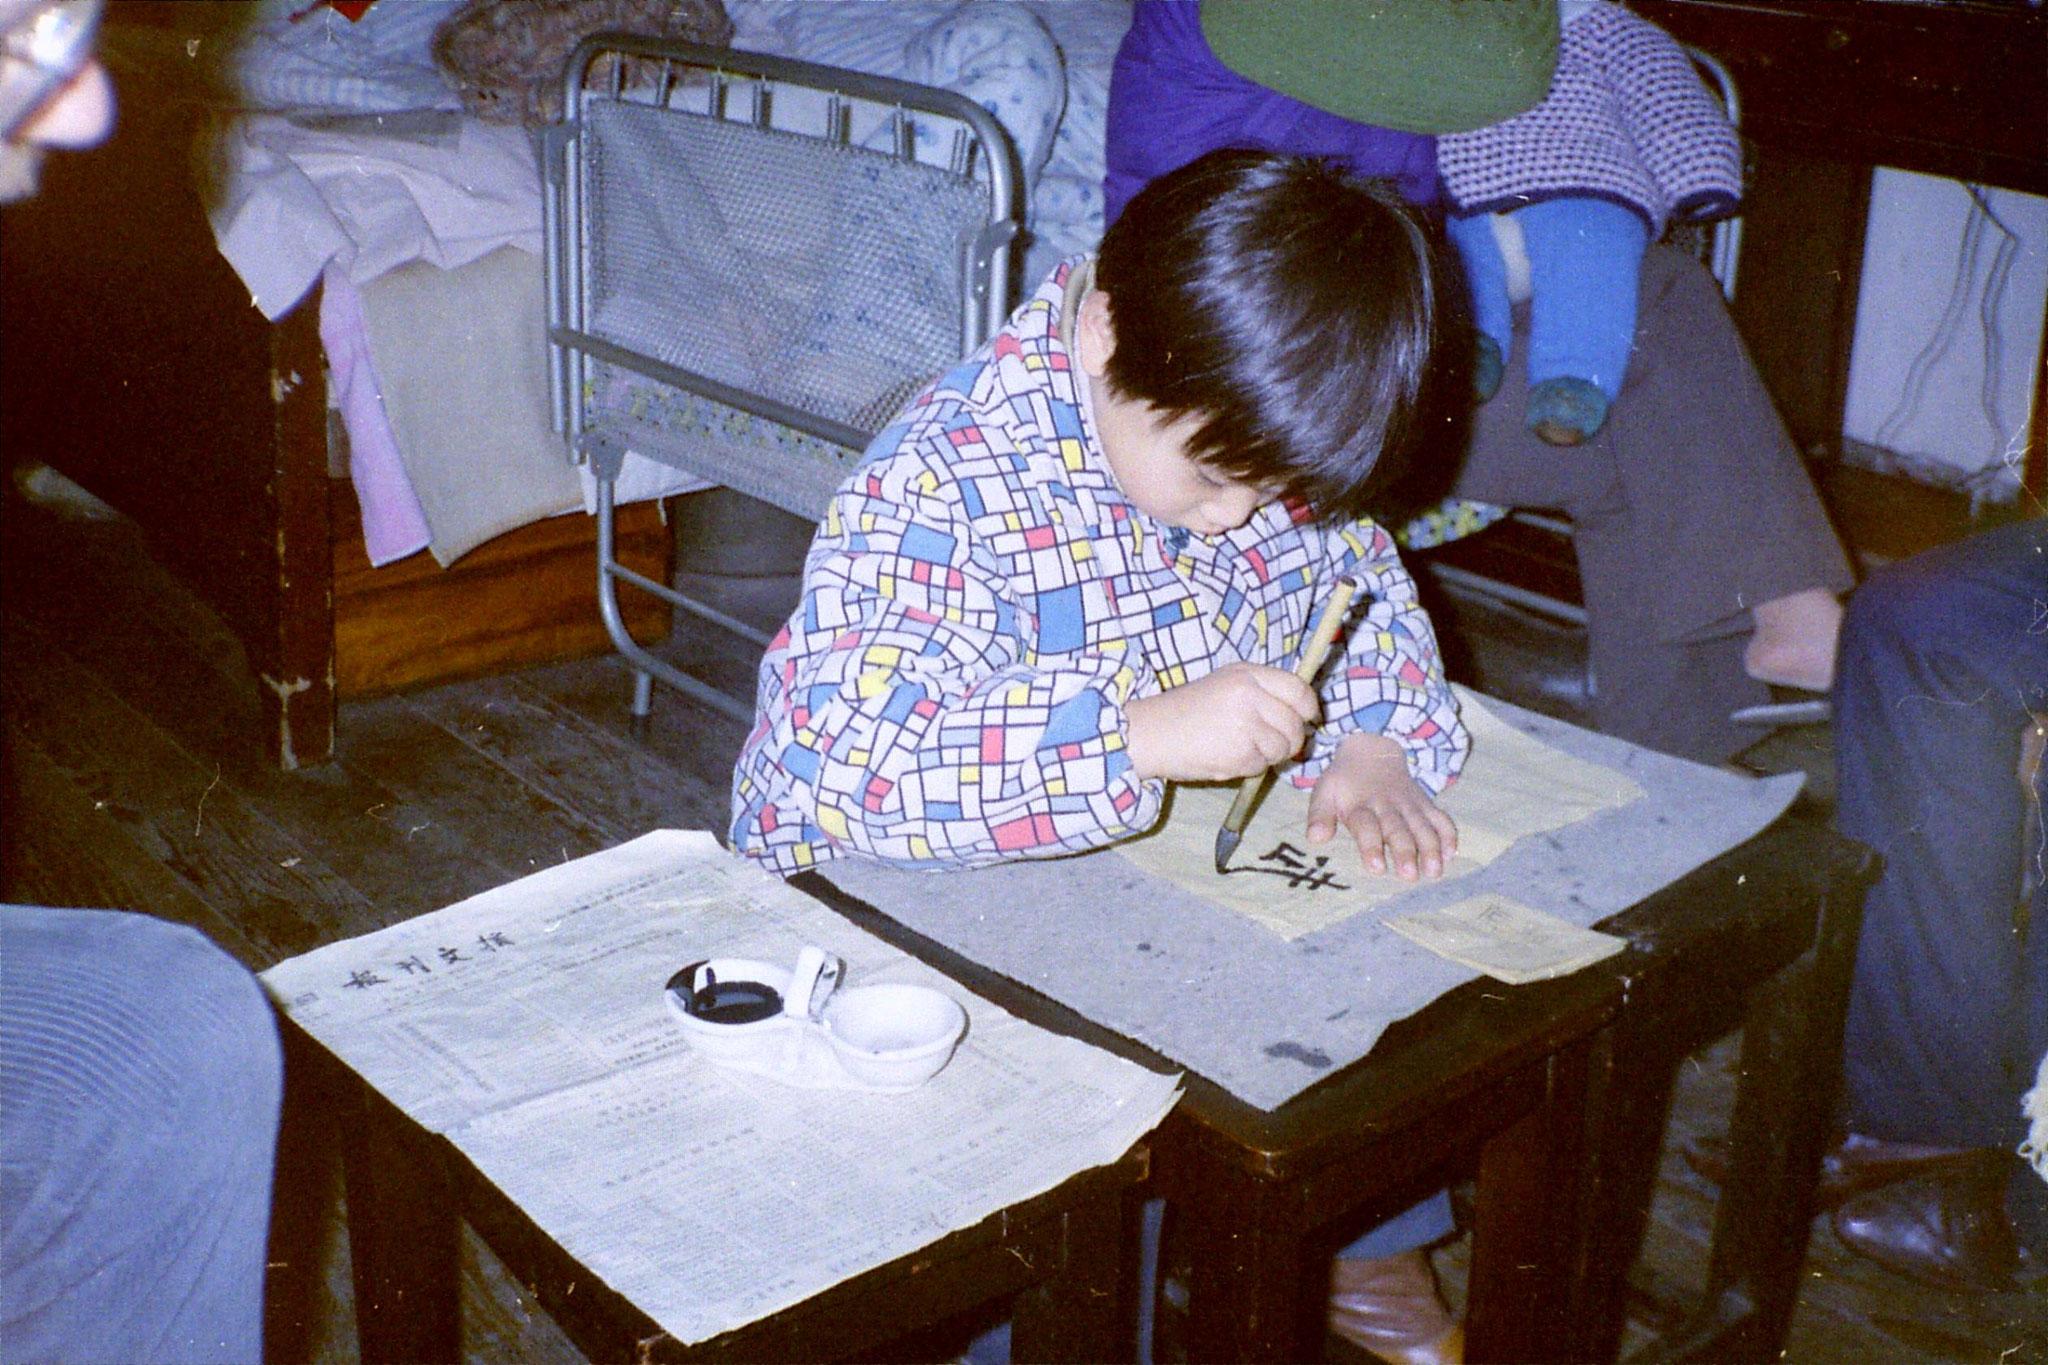 10/2/1989: 15: Shanghai Liu Bo's cousin